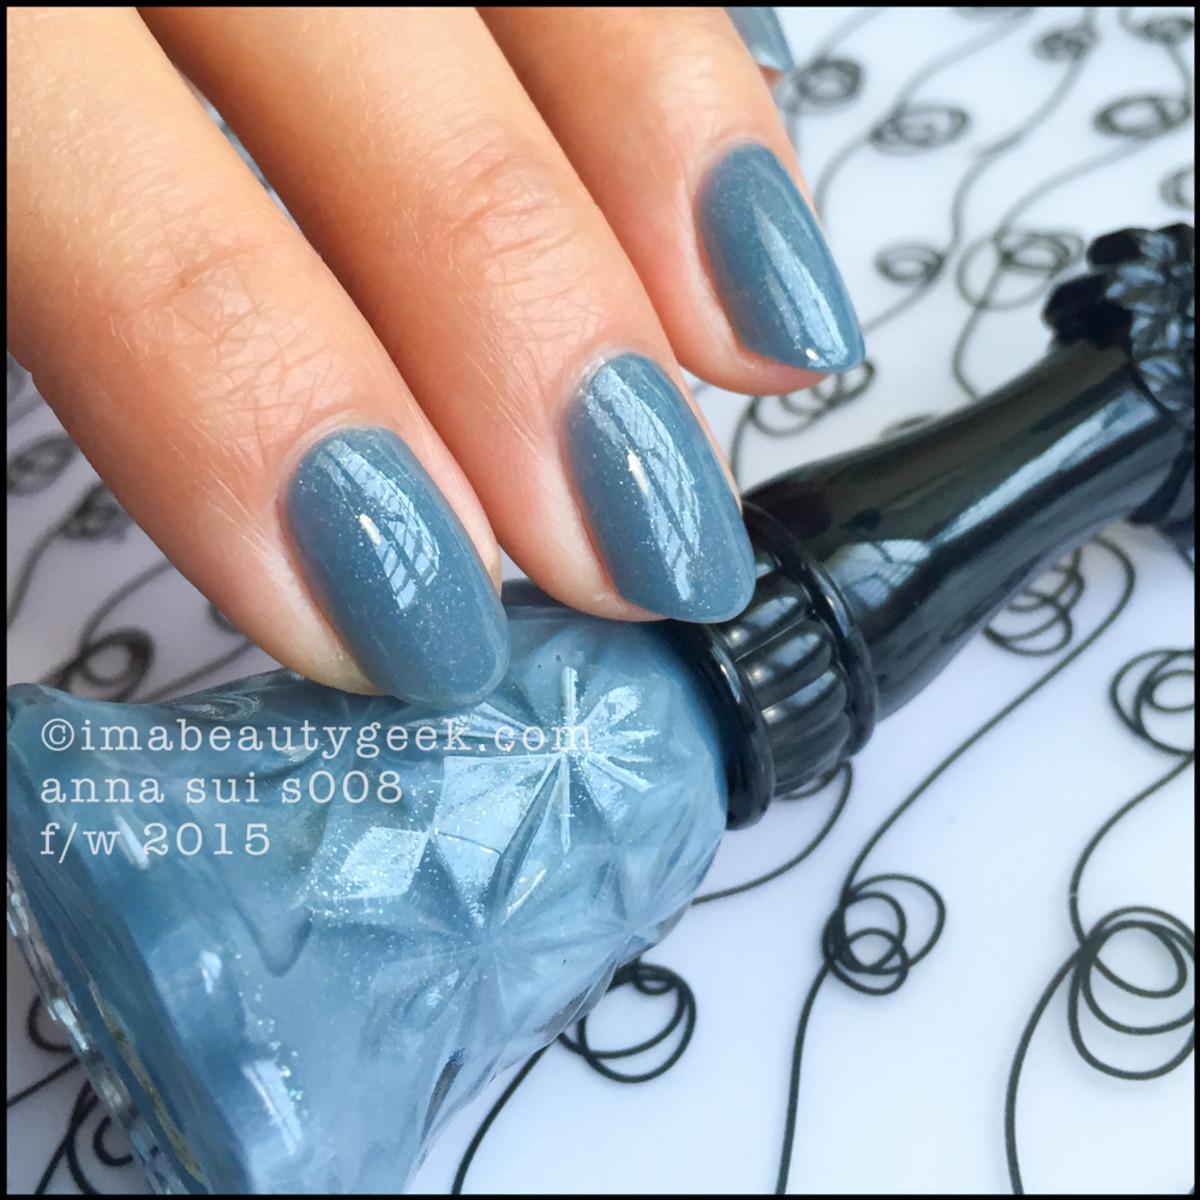 Anna Sui Nail Polish 008_Anna Sui Nail Color s008 2015